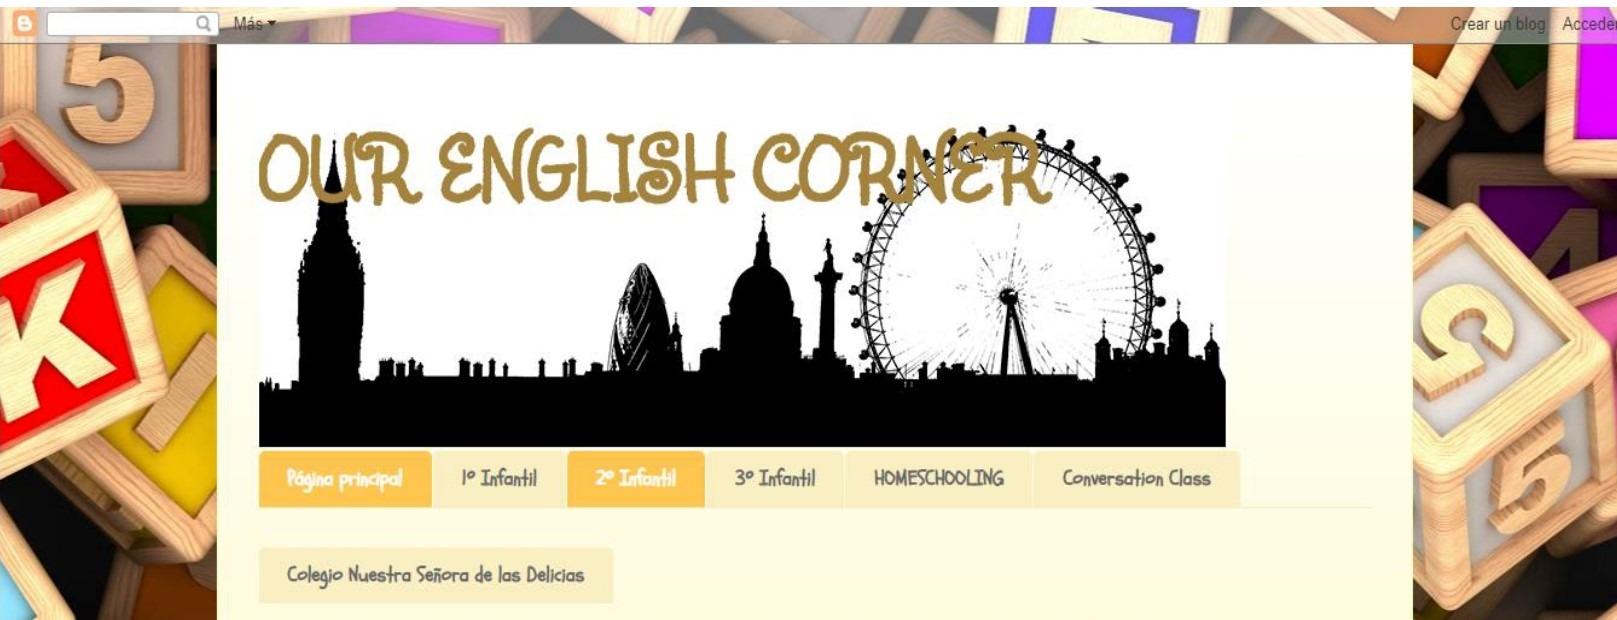 OUR ENGLISH CORNER